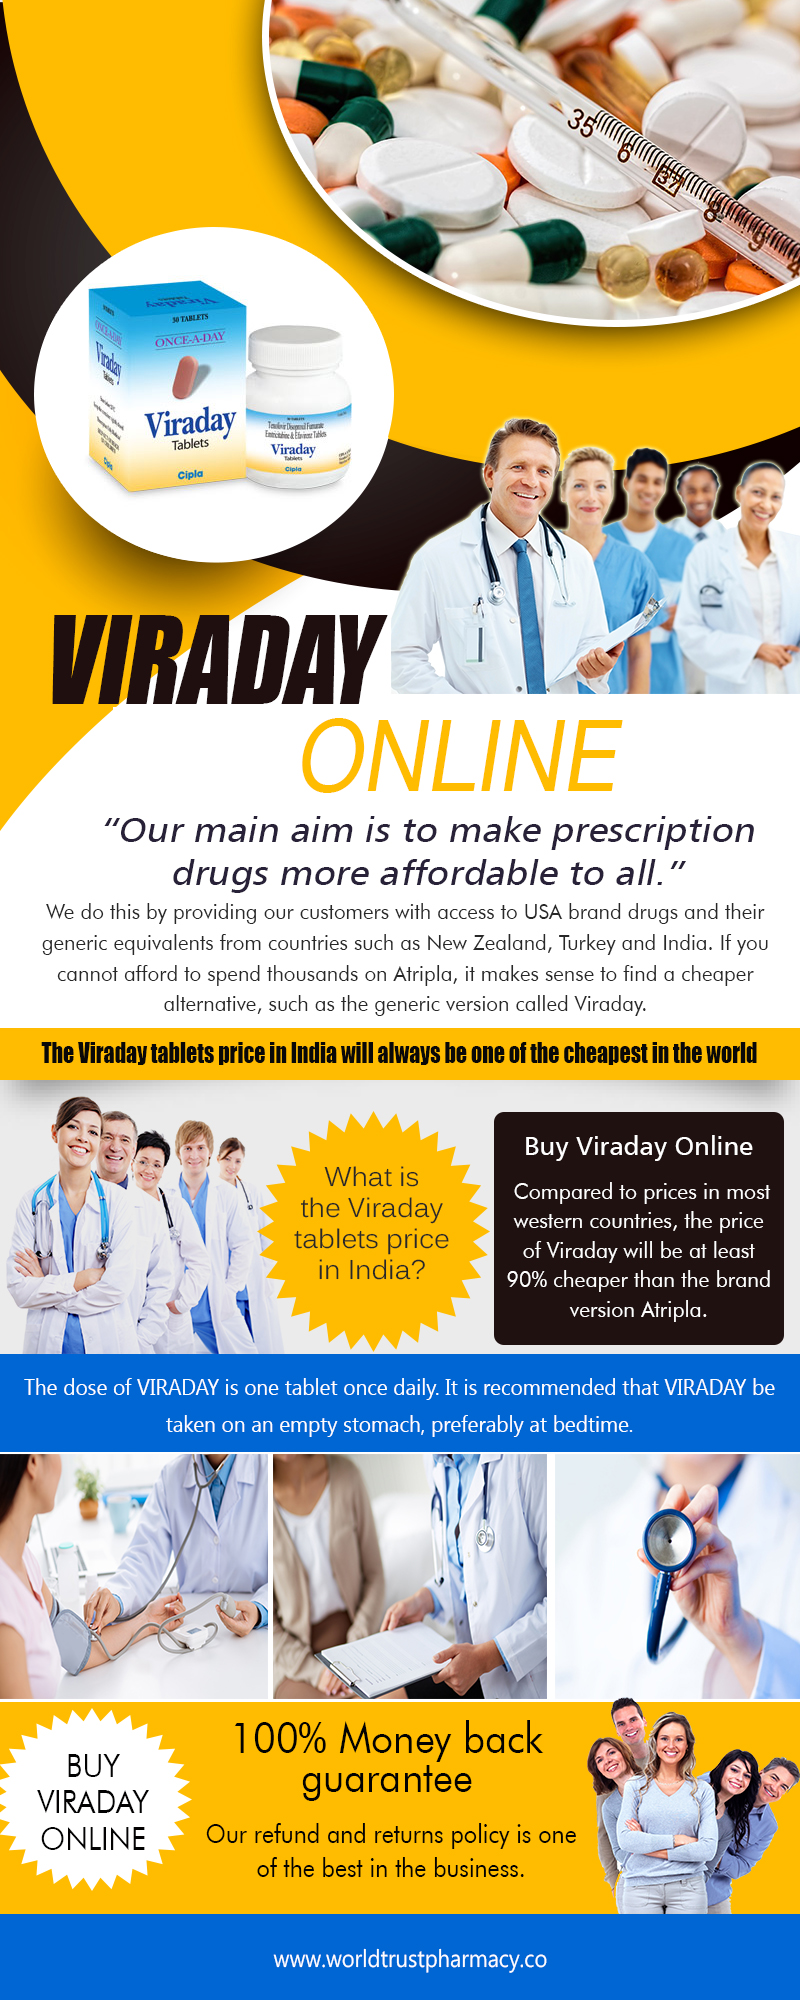 Viraday Online